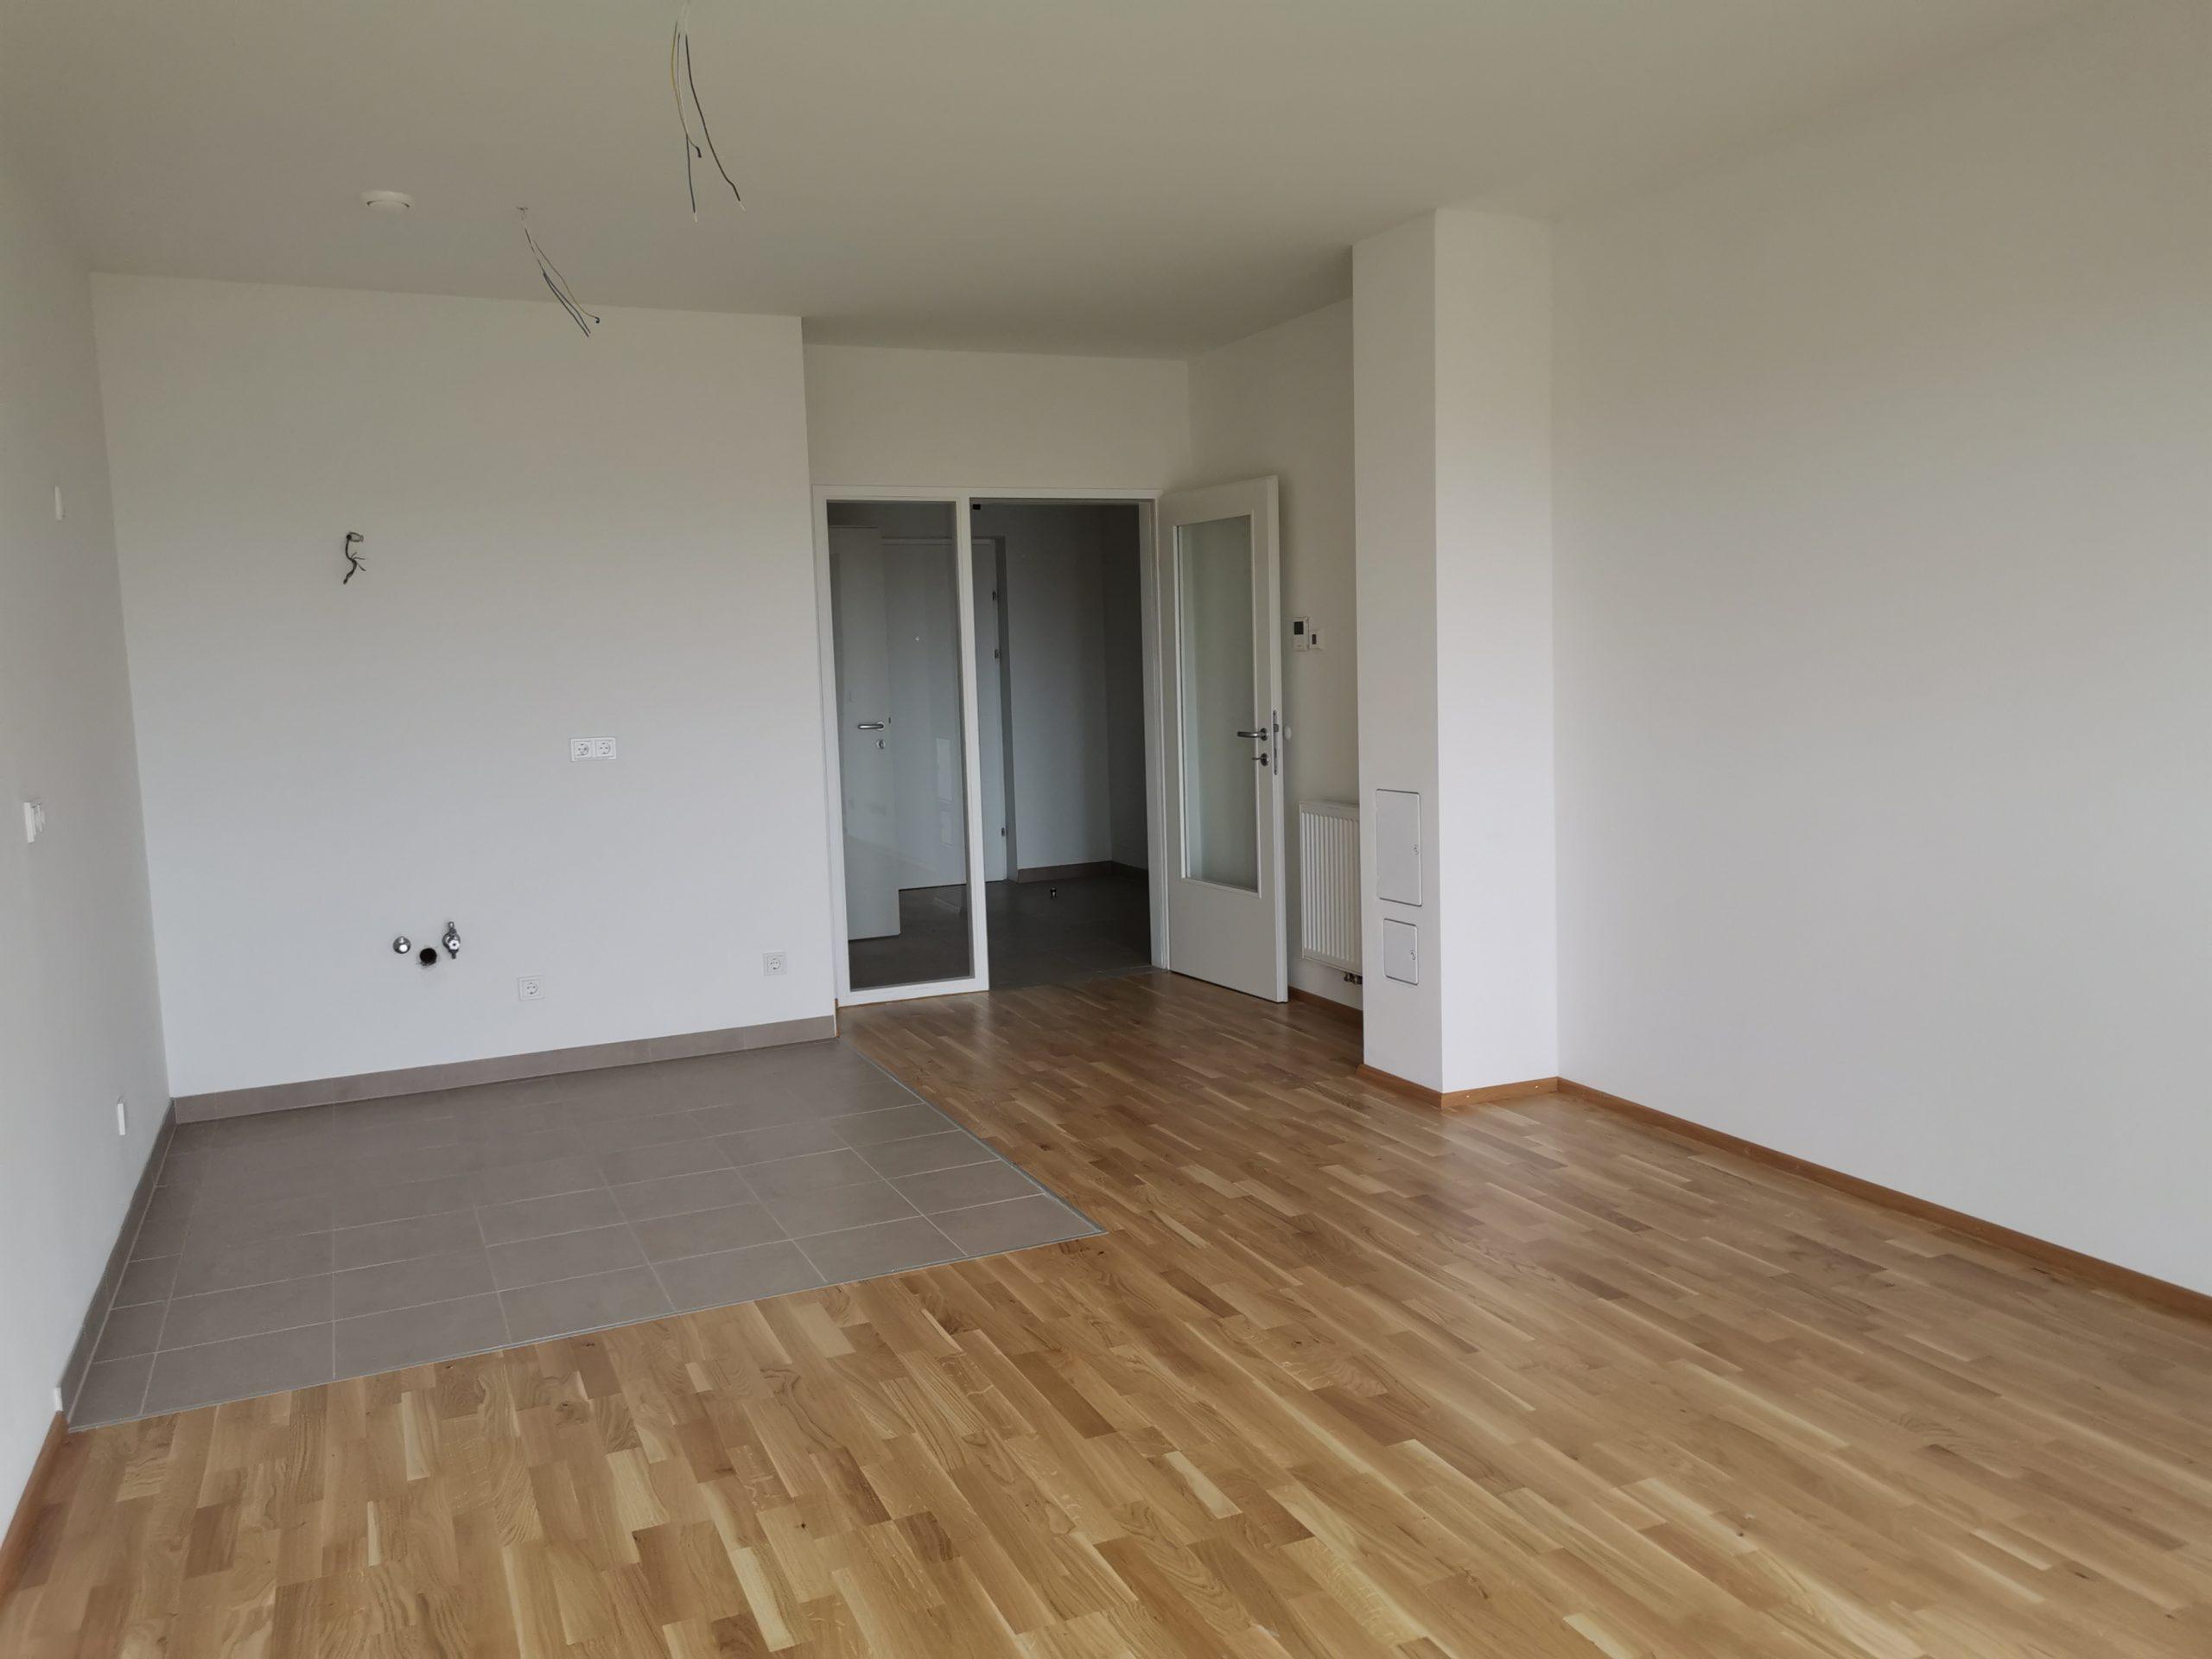 Immobilie von Kamptal in 3730 Eggenburg, Horn, Eggenburg VII - Top 102 #3